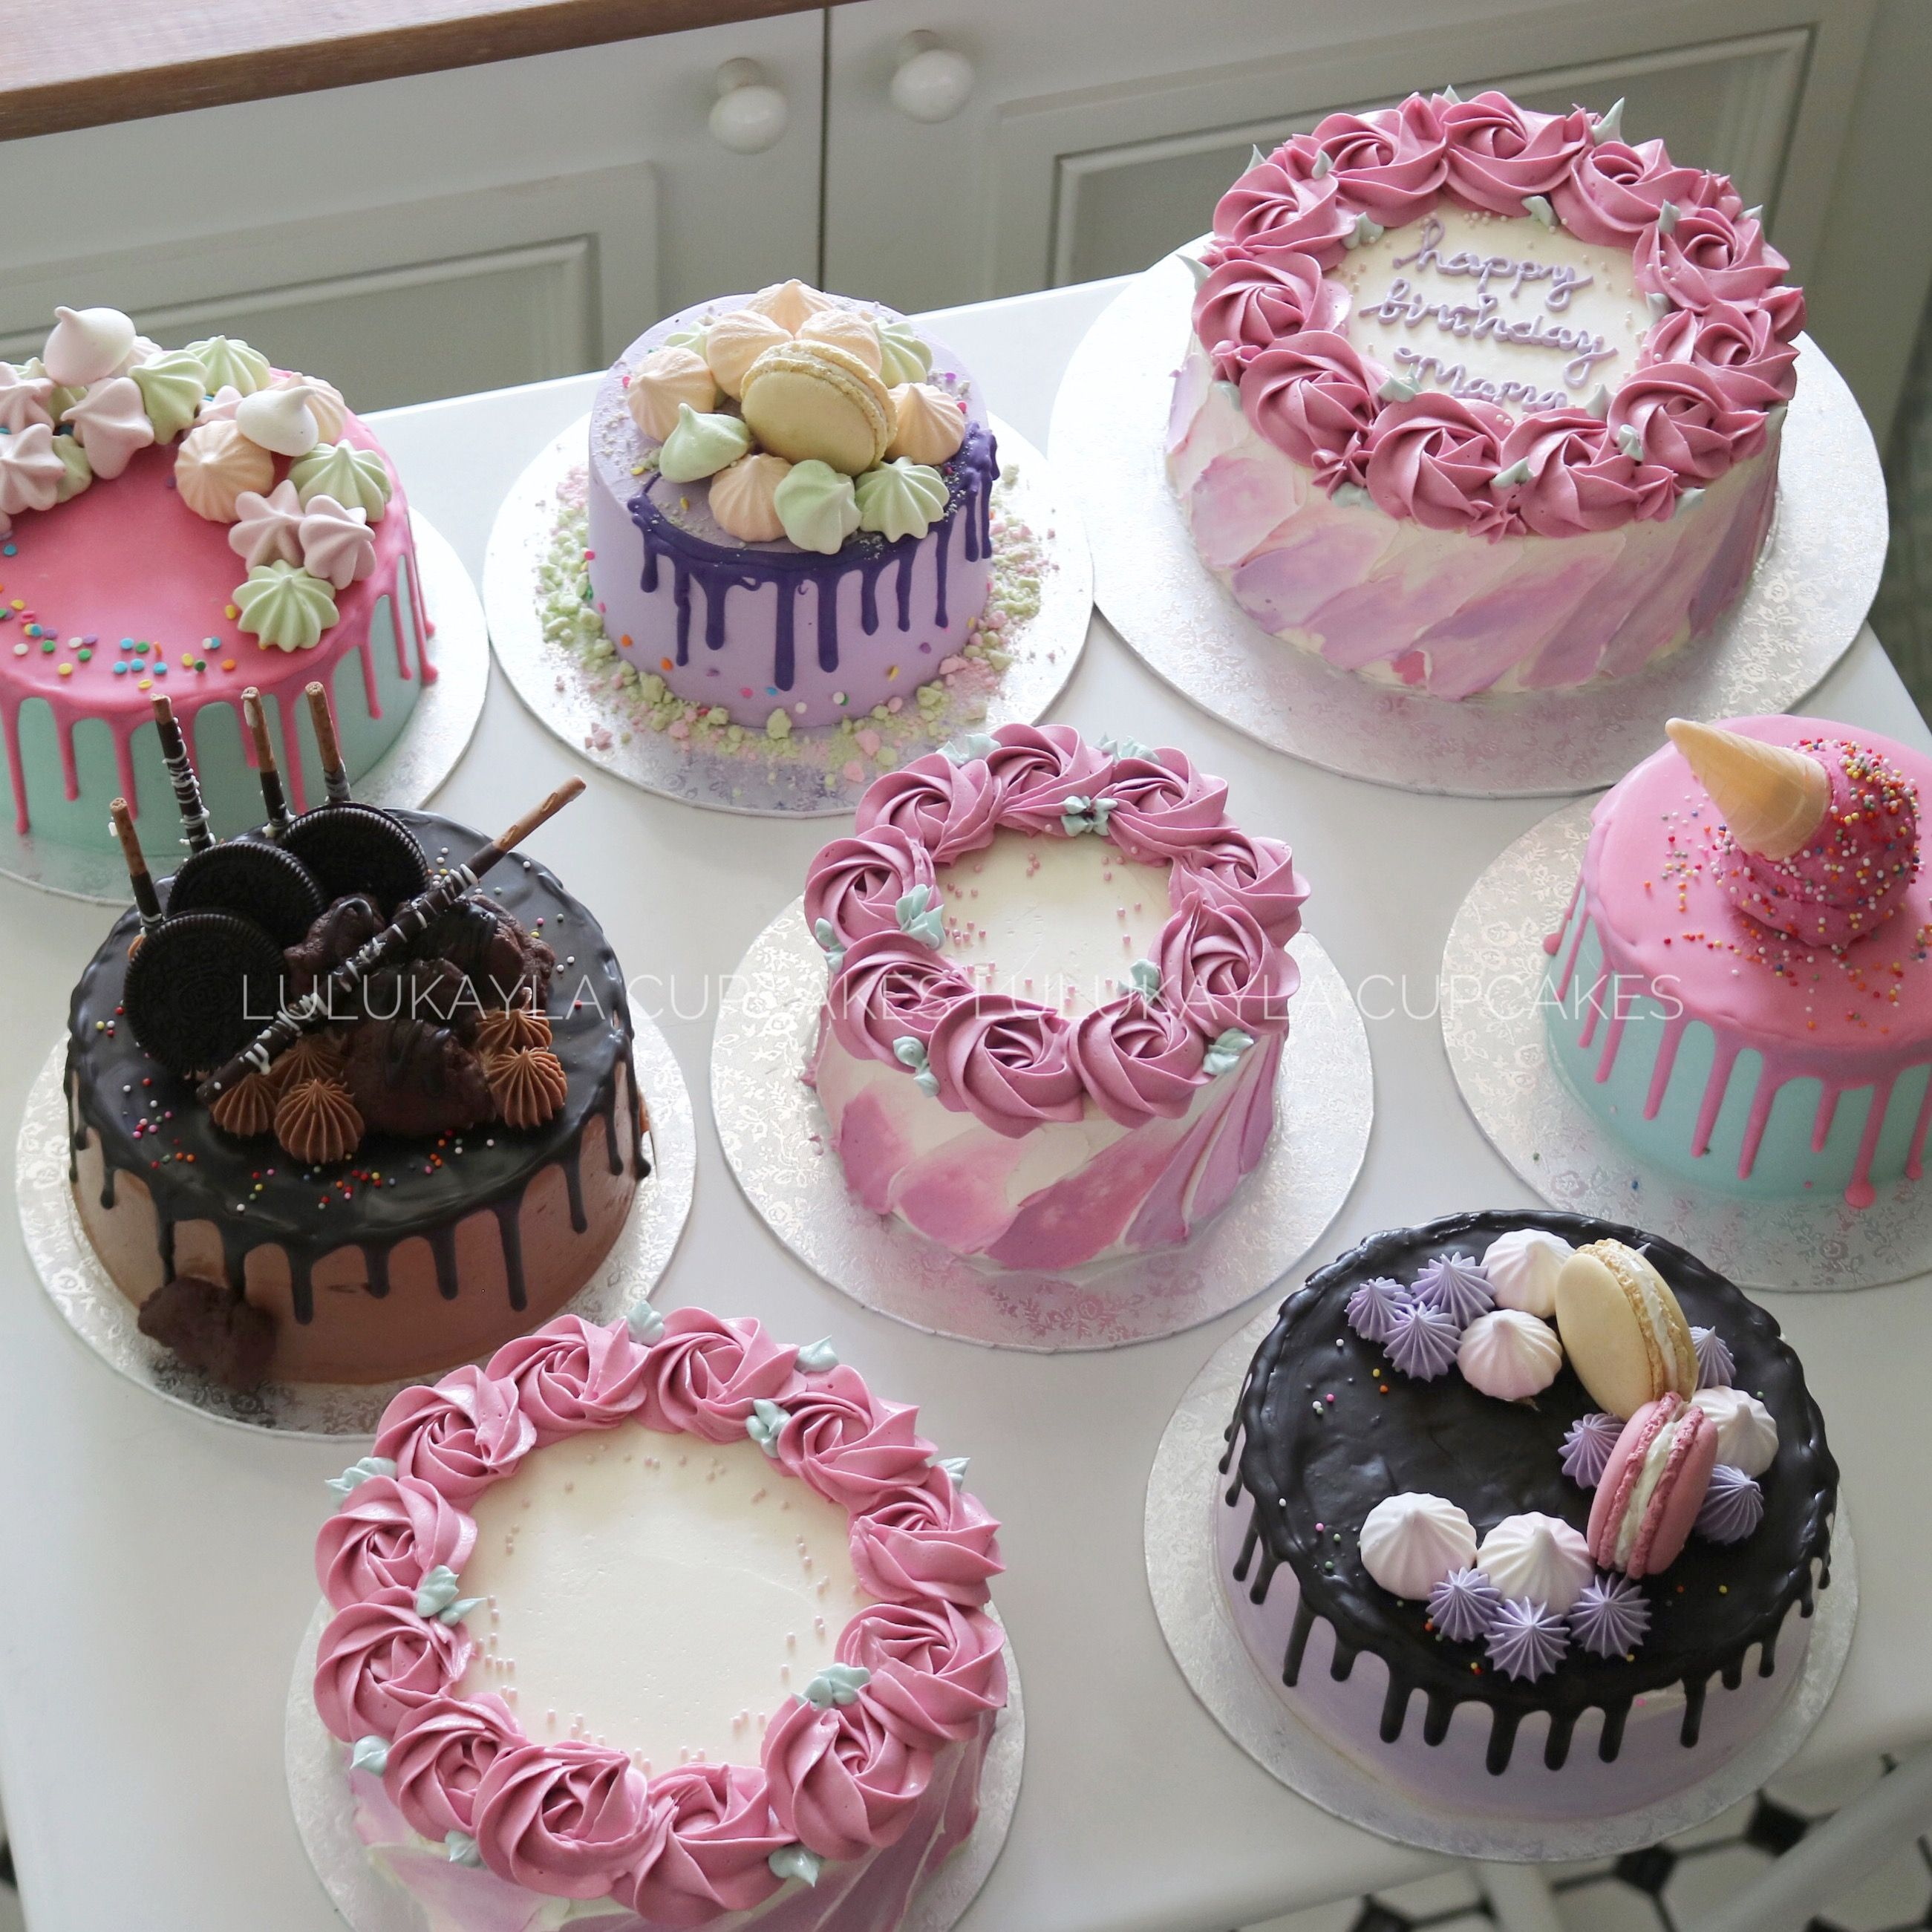 Buttercream cakes cake decorating designs publix cakes